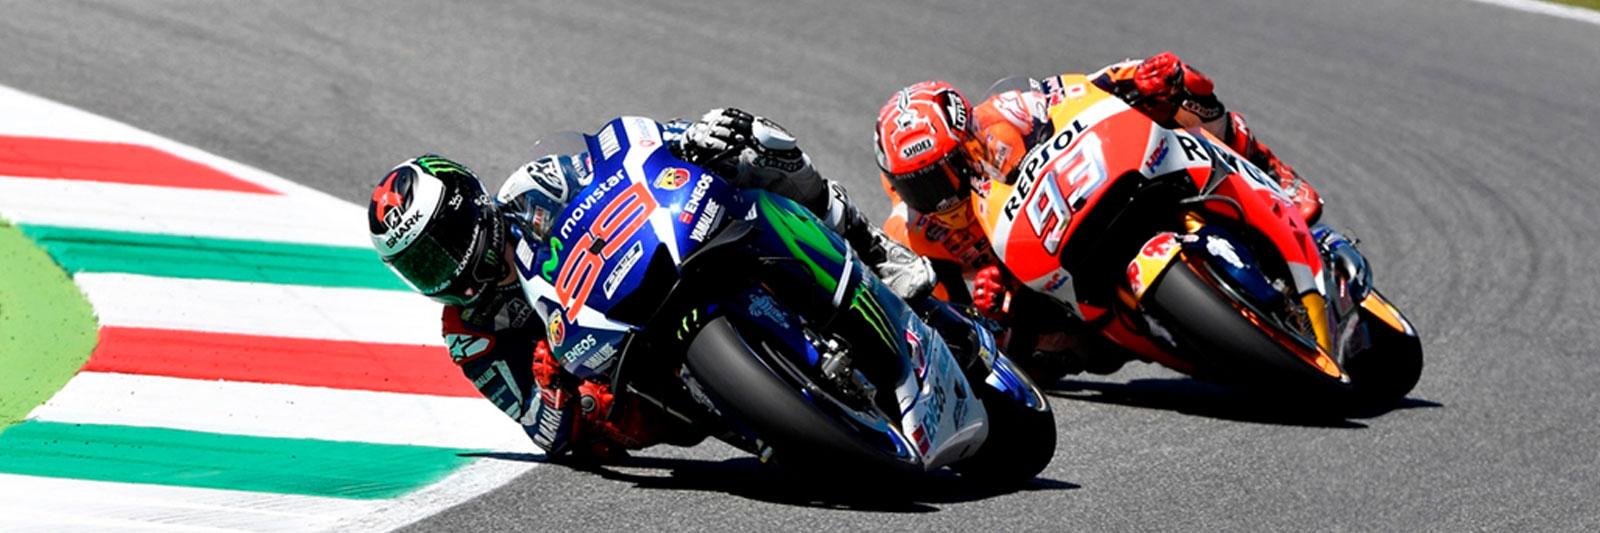 Mugello MotoGP with Grand Prix Tours.